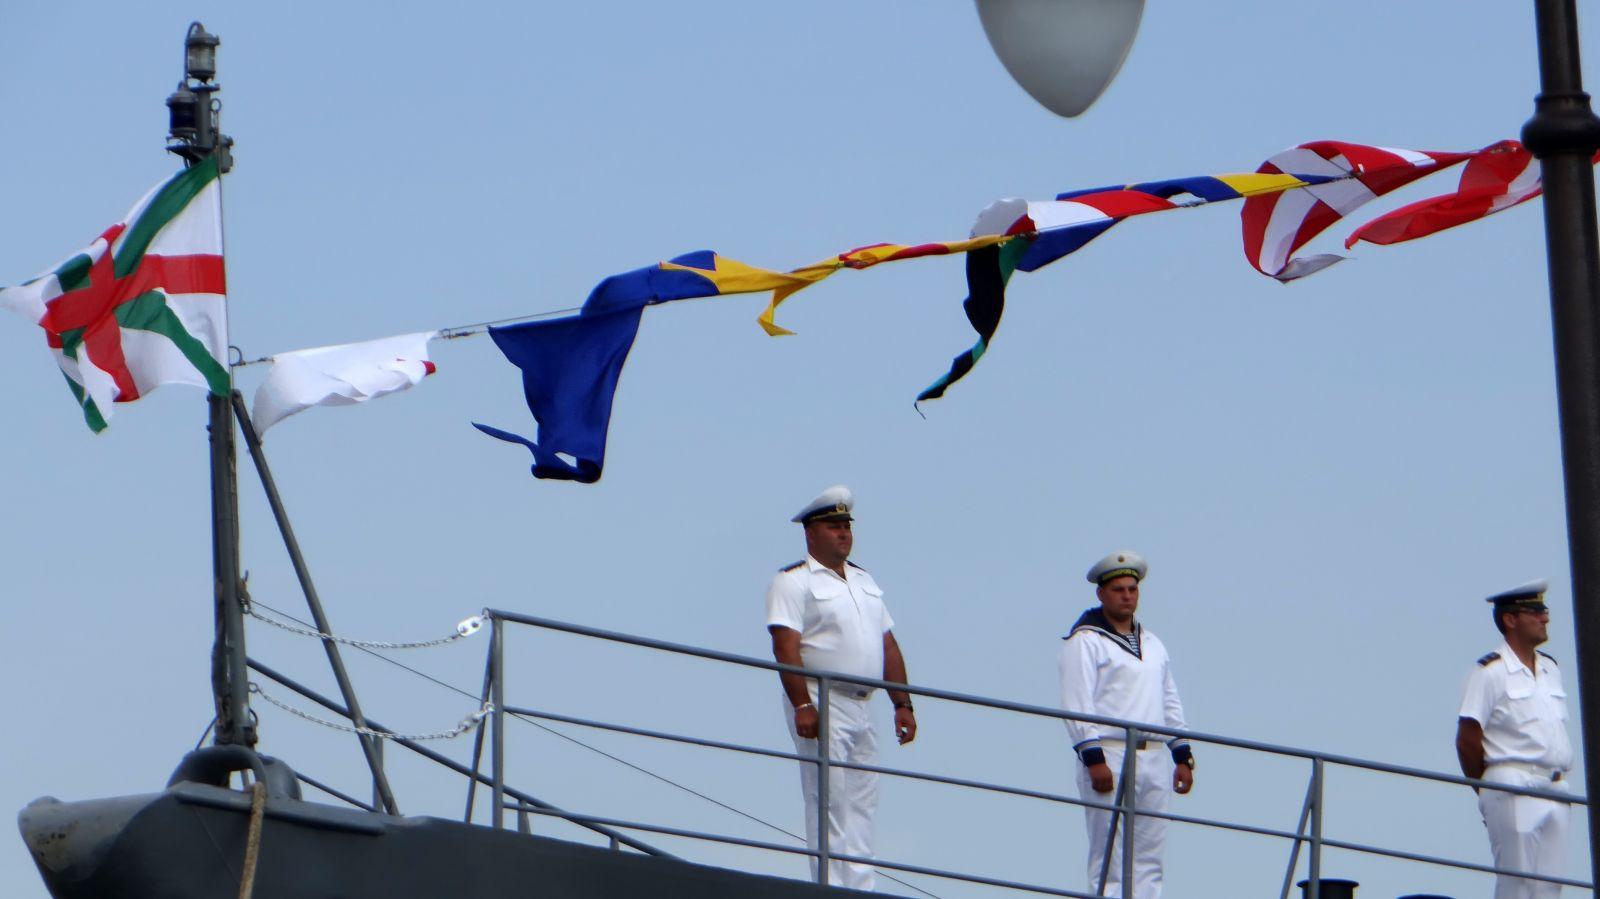 ГАЛЕРИЯ: 141 ГОДИНИ ВМС - КОРАБИТЕ